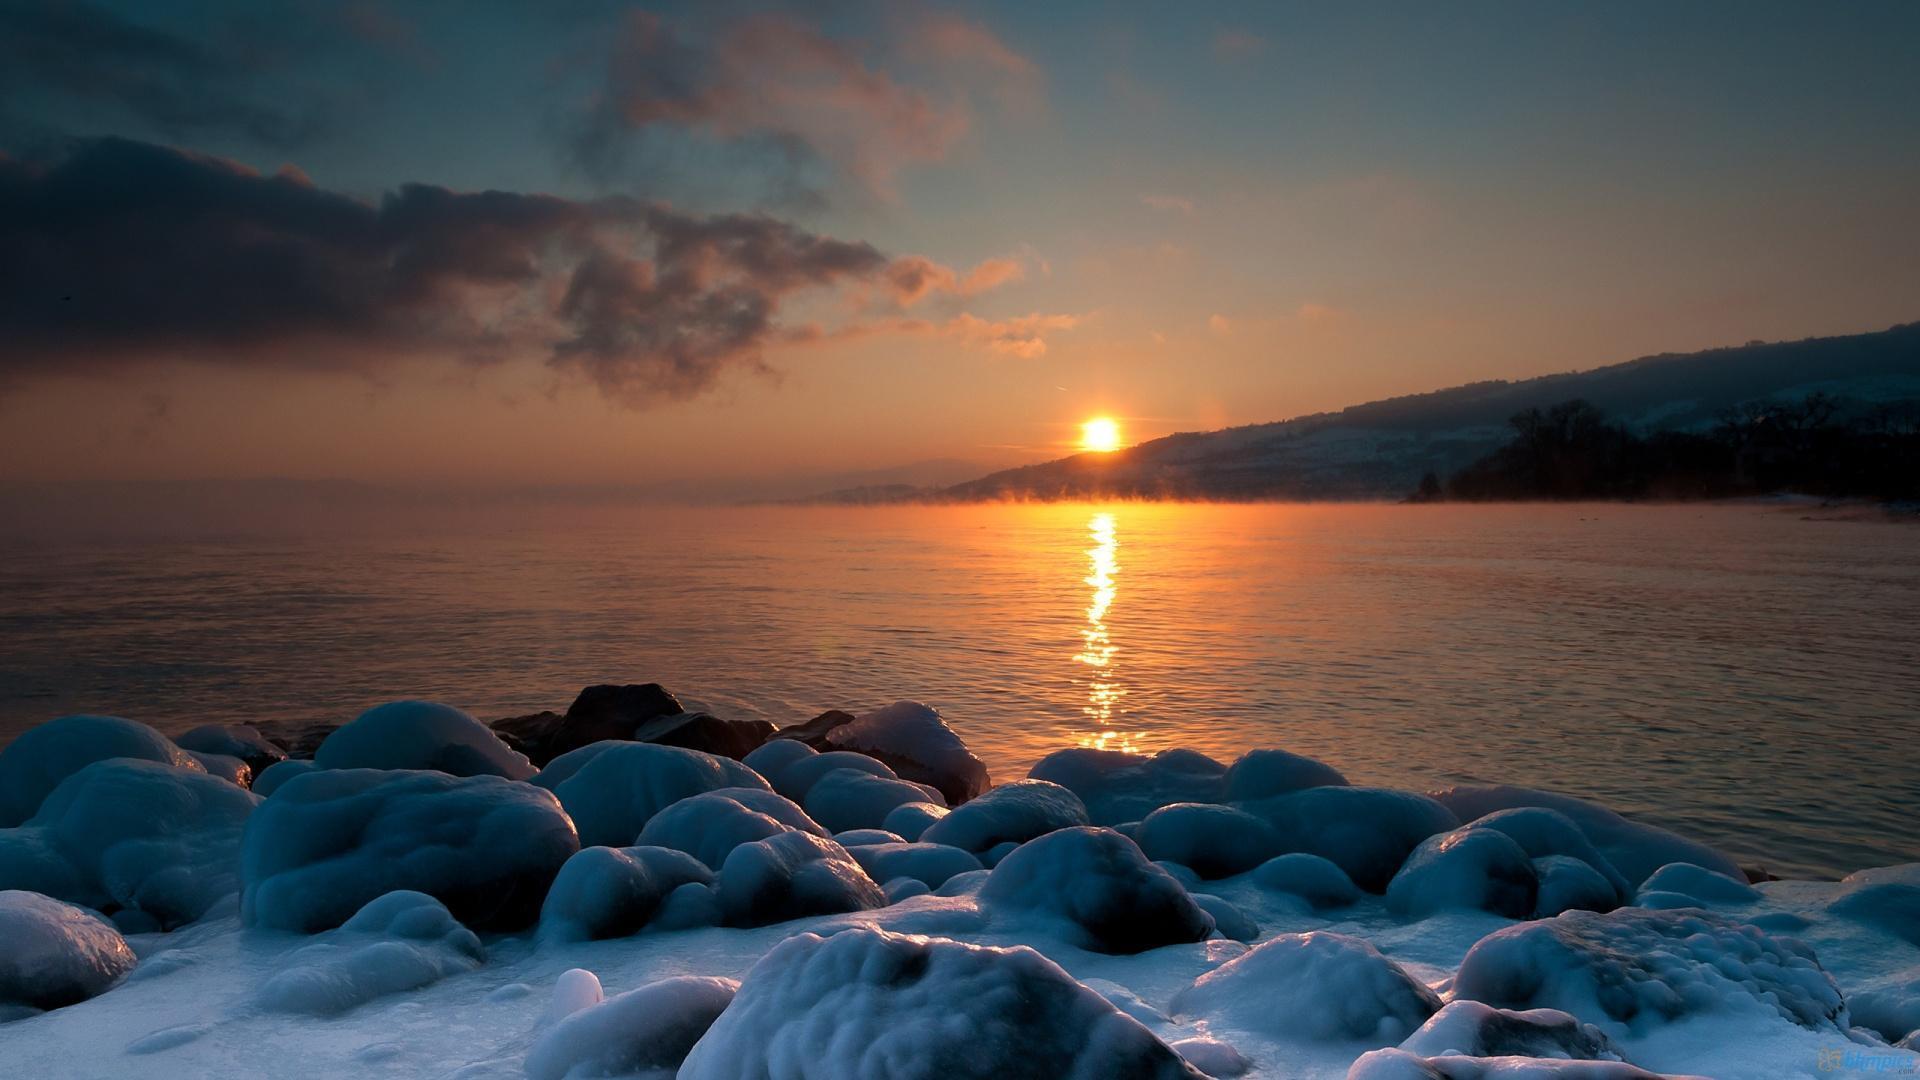 Winter Sunset Wallpapers - Wallpaper Cave